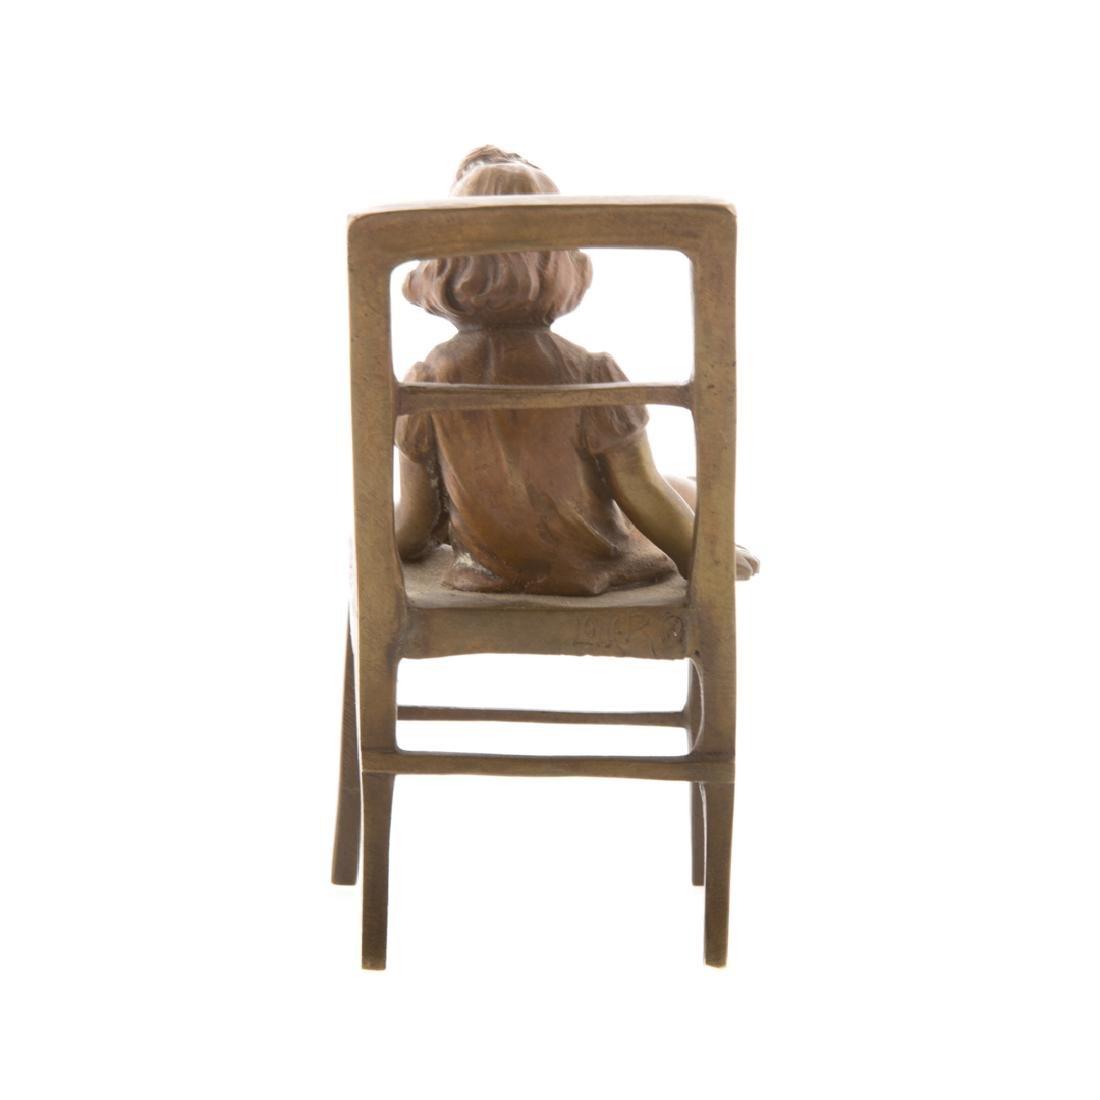 Austrian bronze little girl in chair - 3